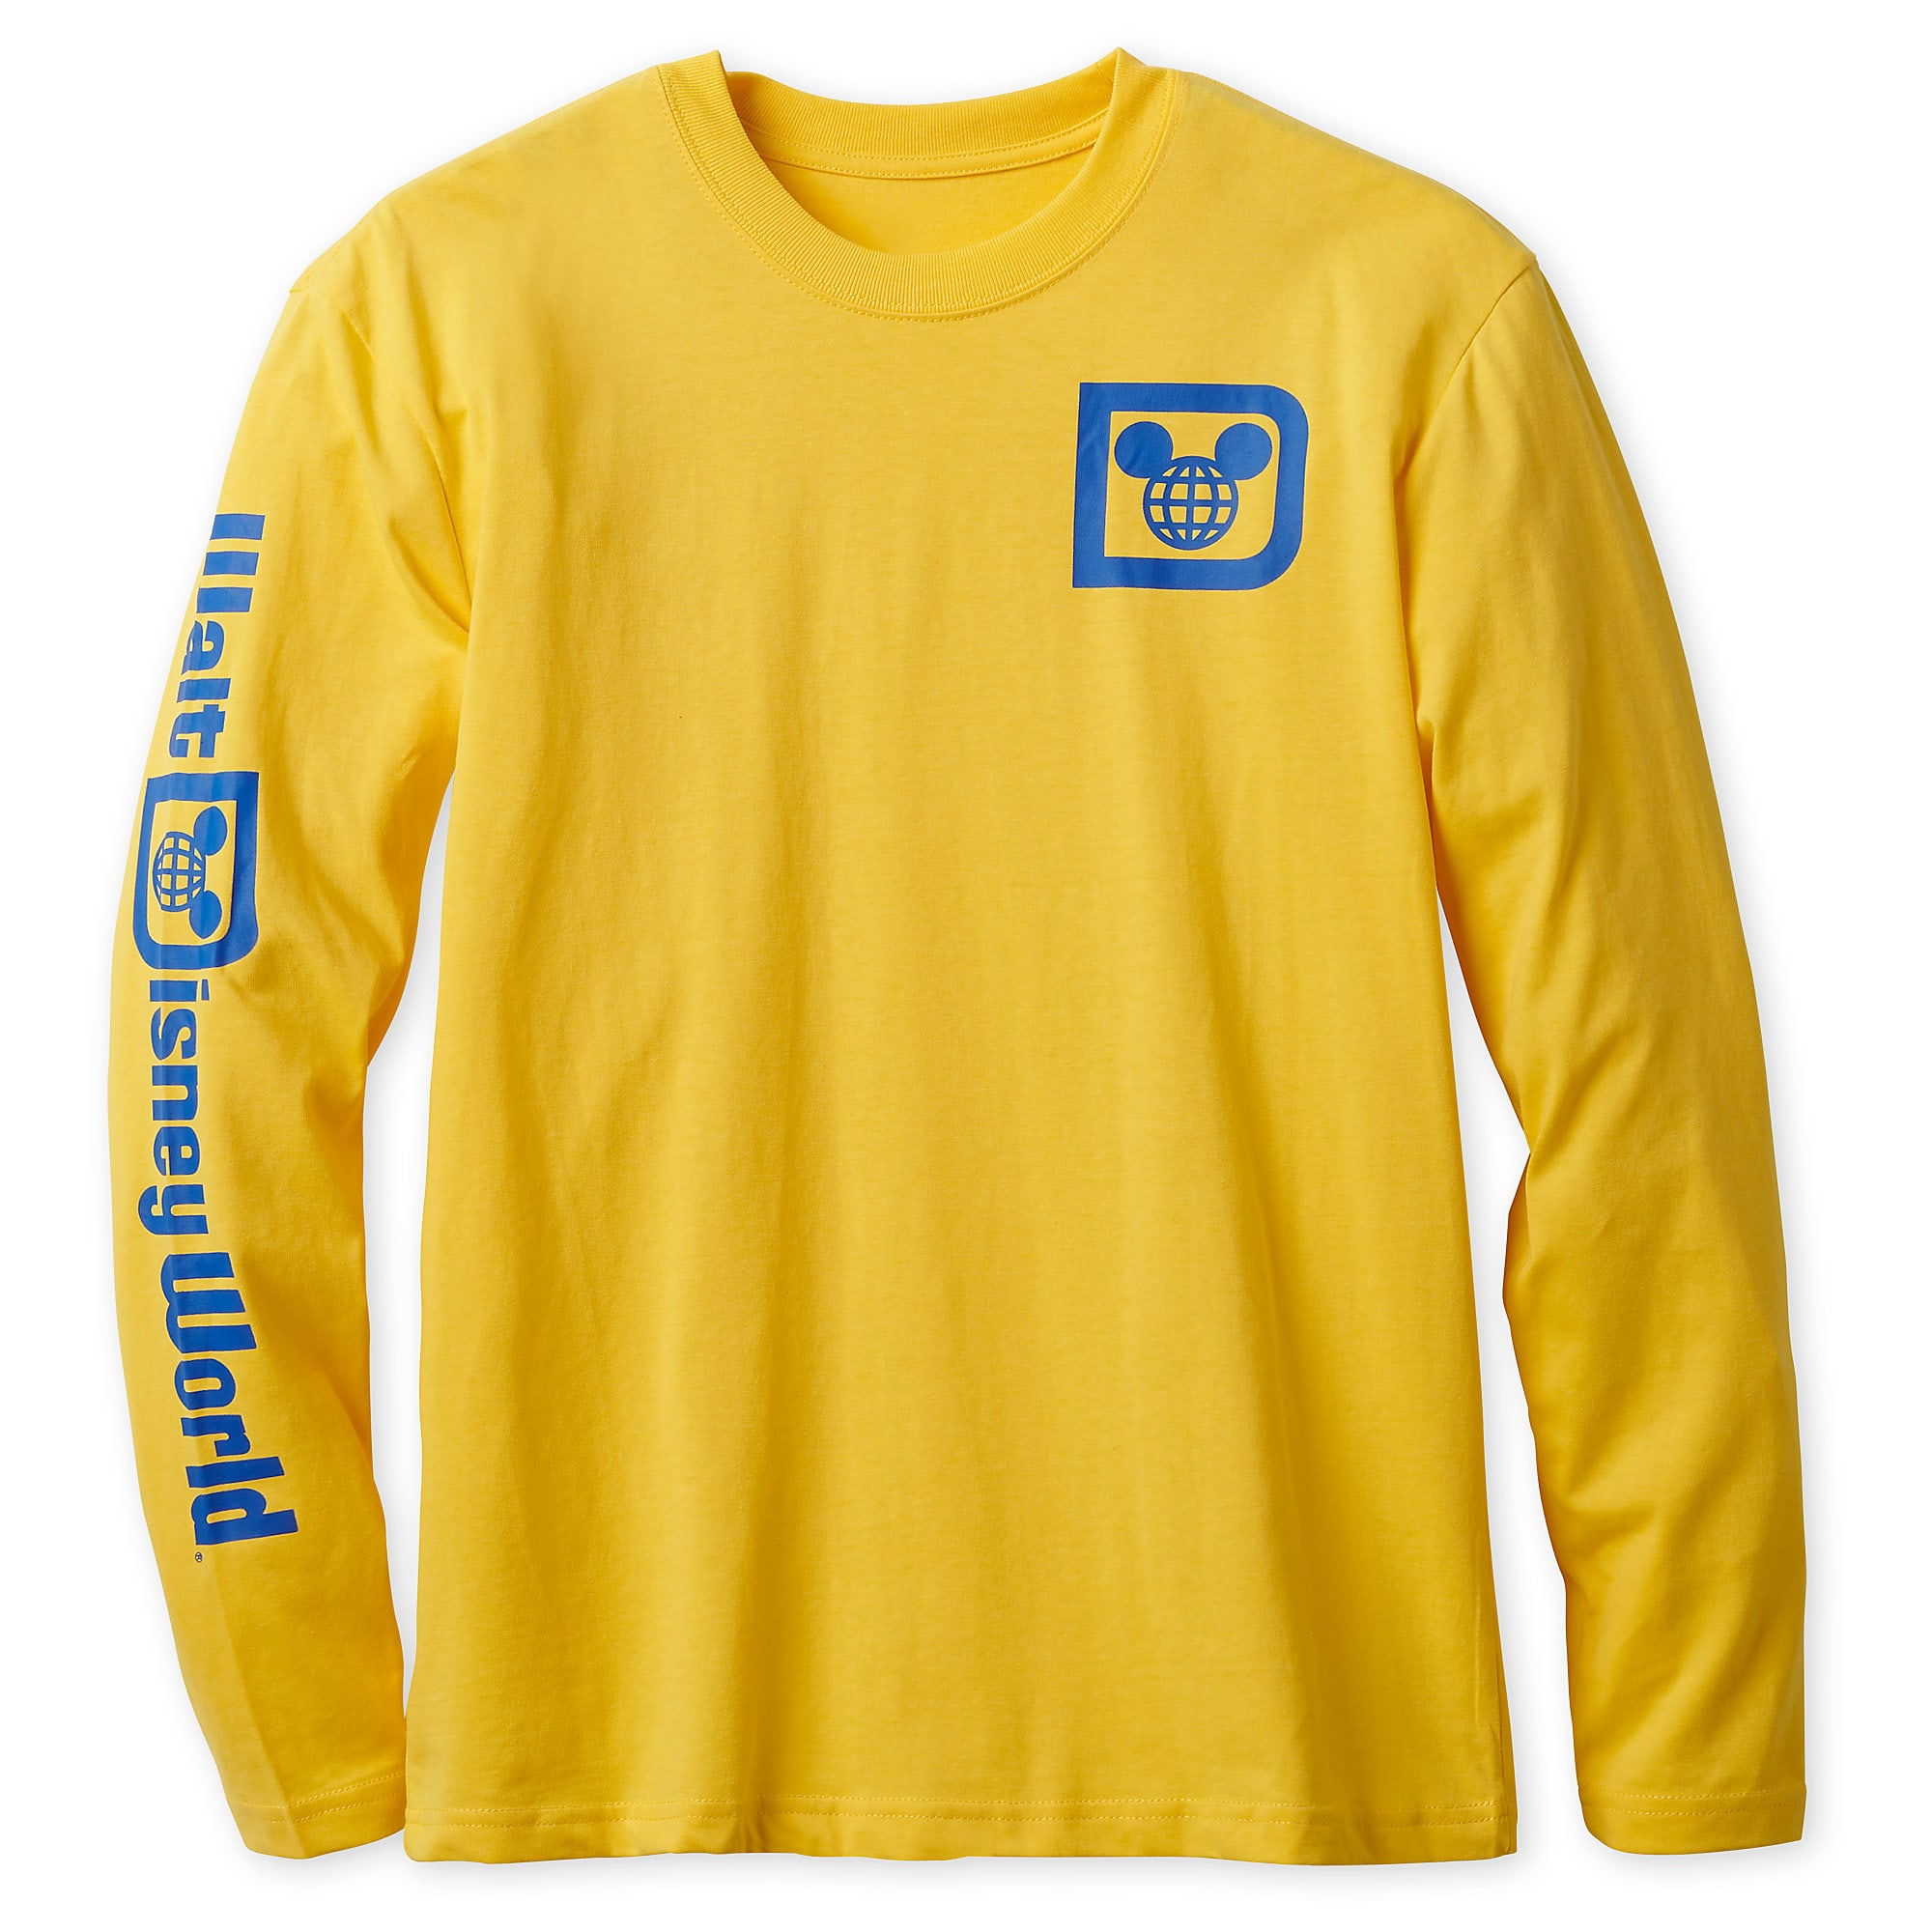 Walt Disney World Logo Long Sleeve Tee for Adults - Yellow ...